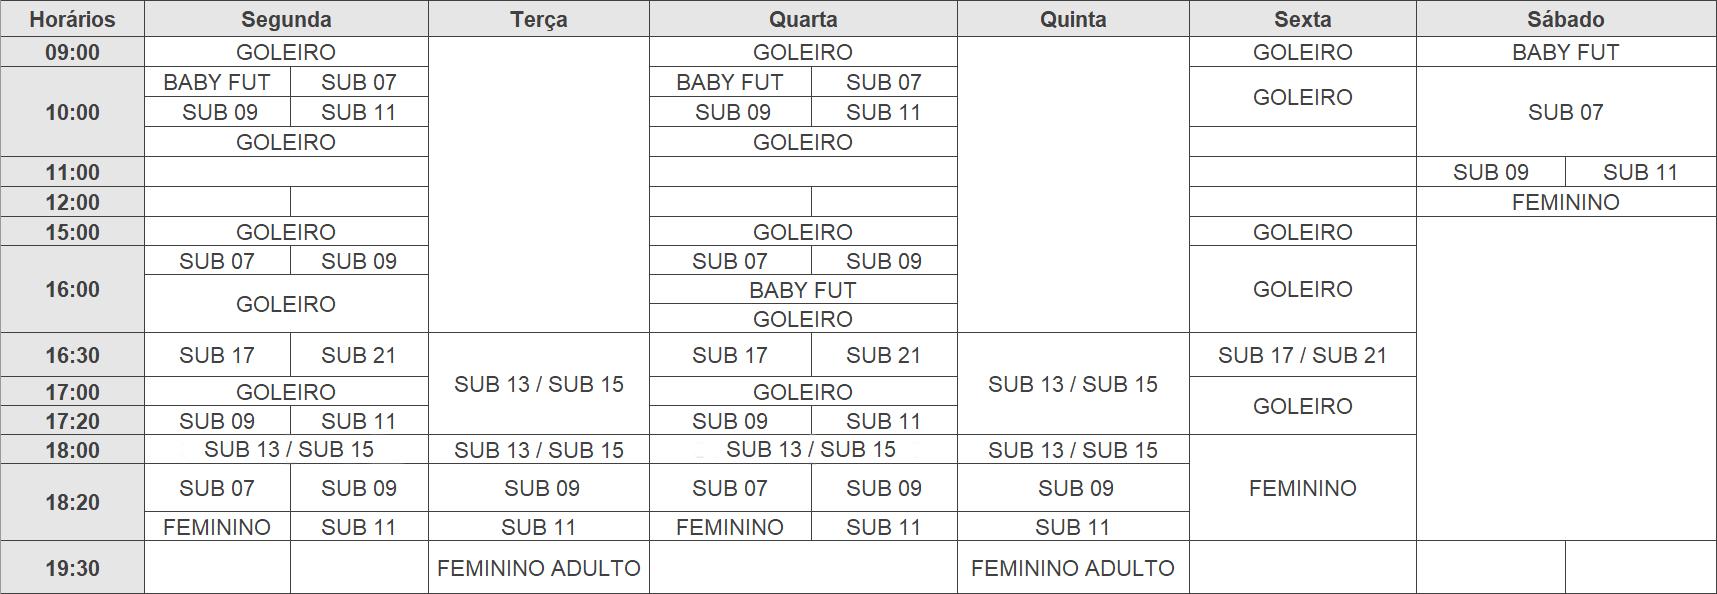 2020_01_10-parque_esportivo-orlando_city_soccer_school-tabela_horarios-02